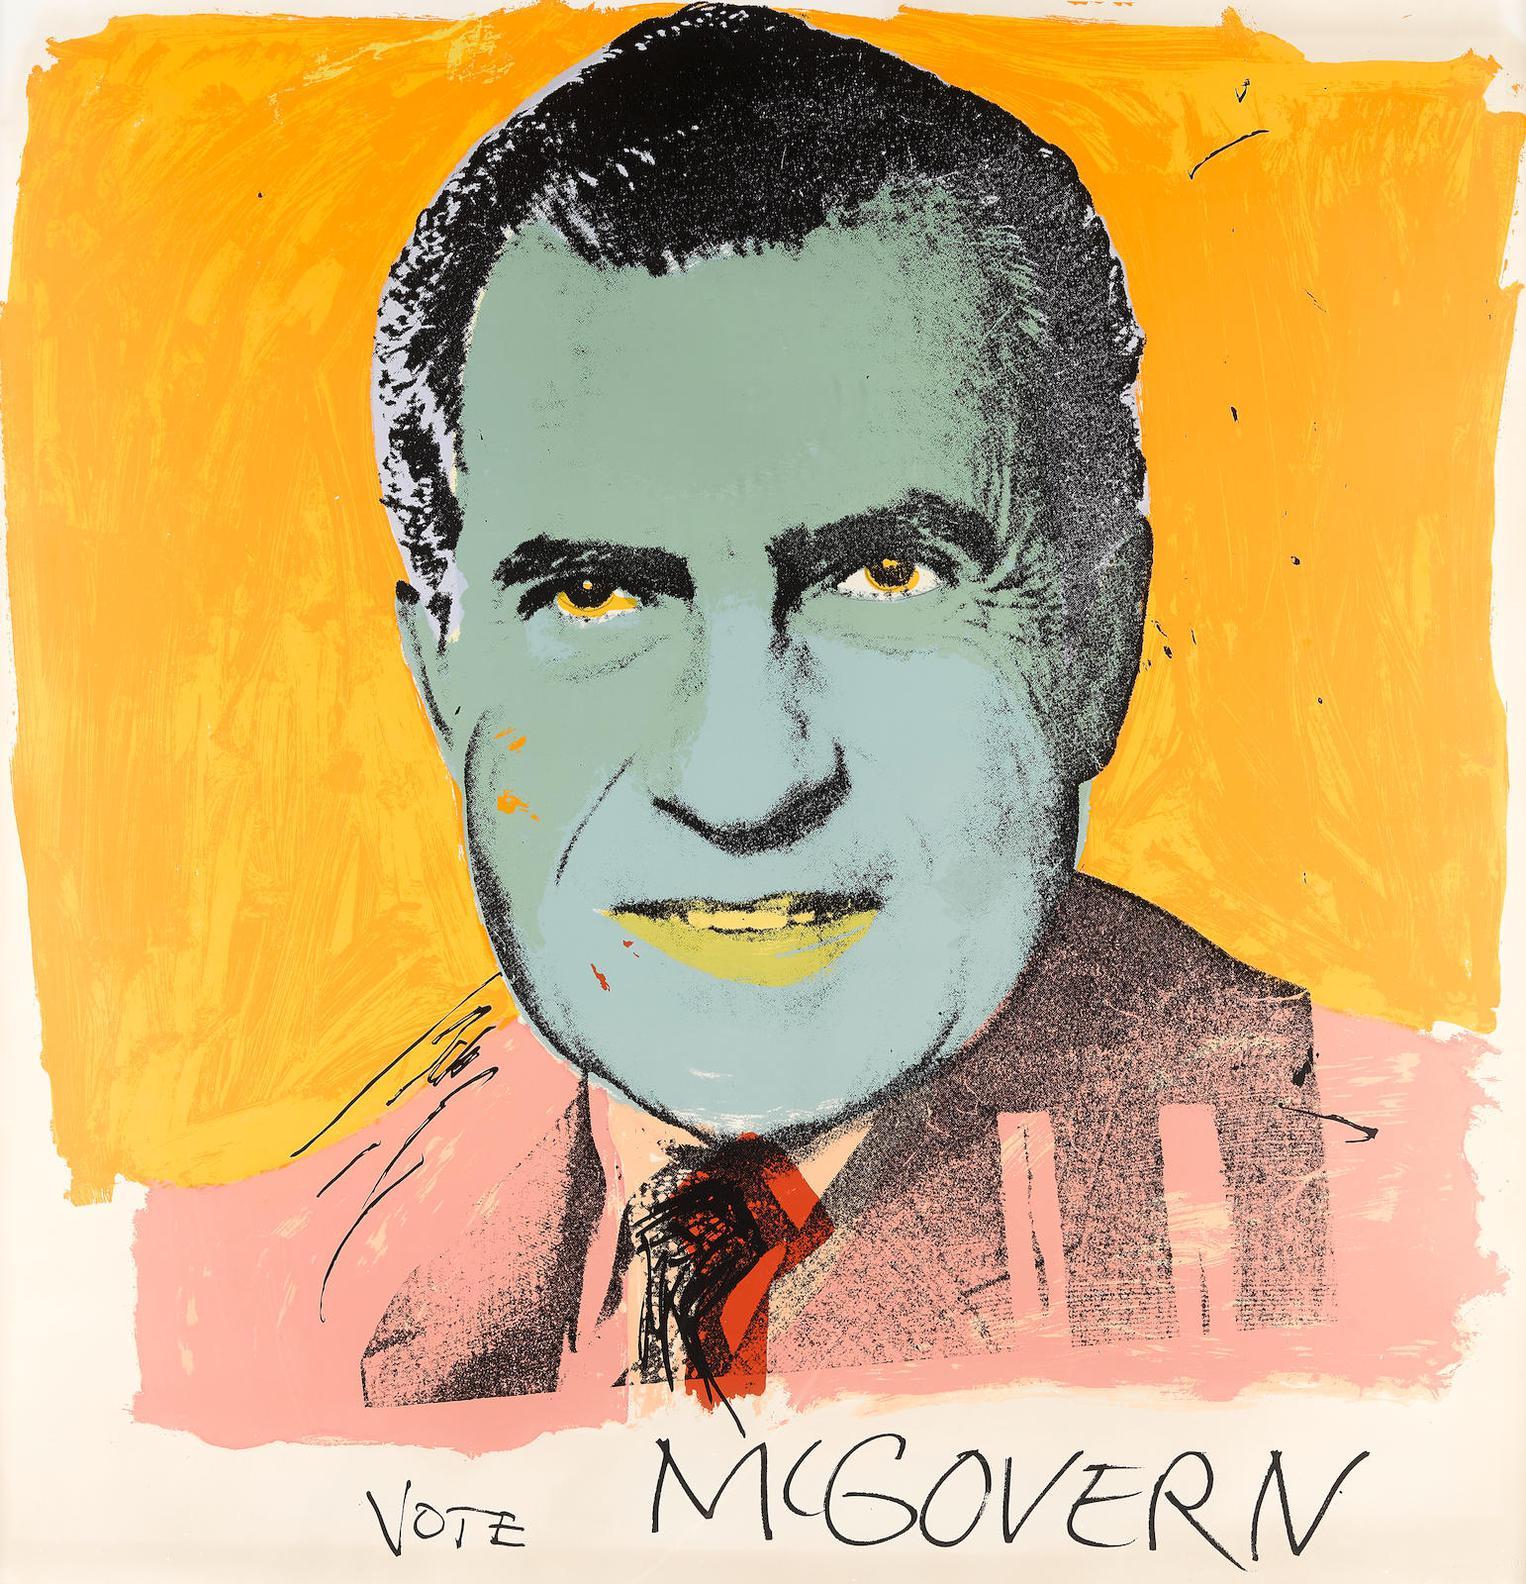 Andy Warhol-Vote Mcgovern (F./S. II 84)-1972